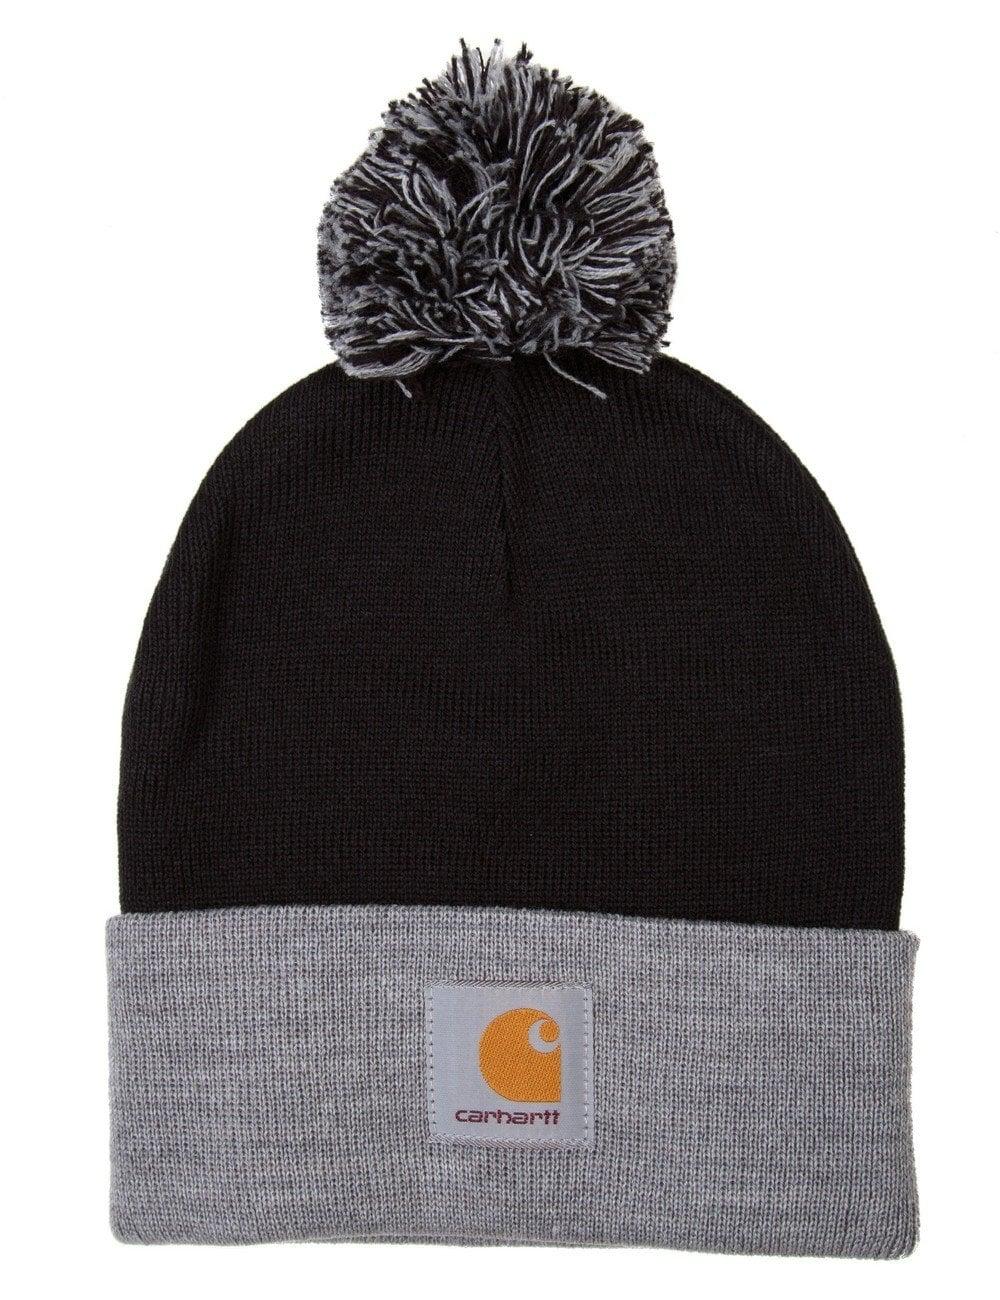 Carhartt WIP Britt Bobble Beanie Hat - Black Grey Heather - Hat Shop ... 2e40380a828f